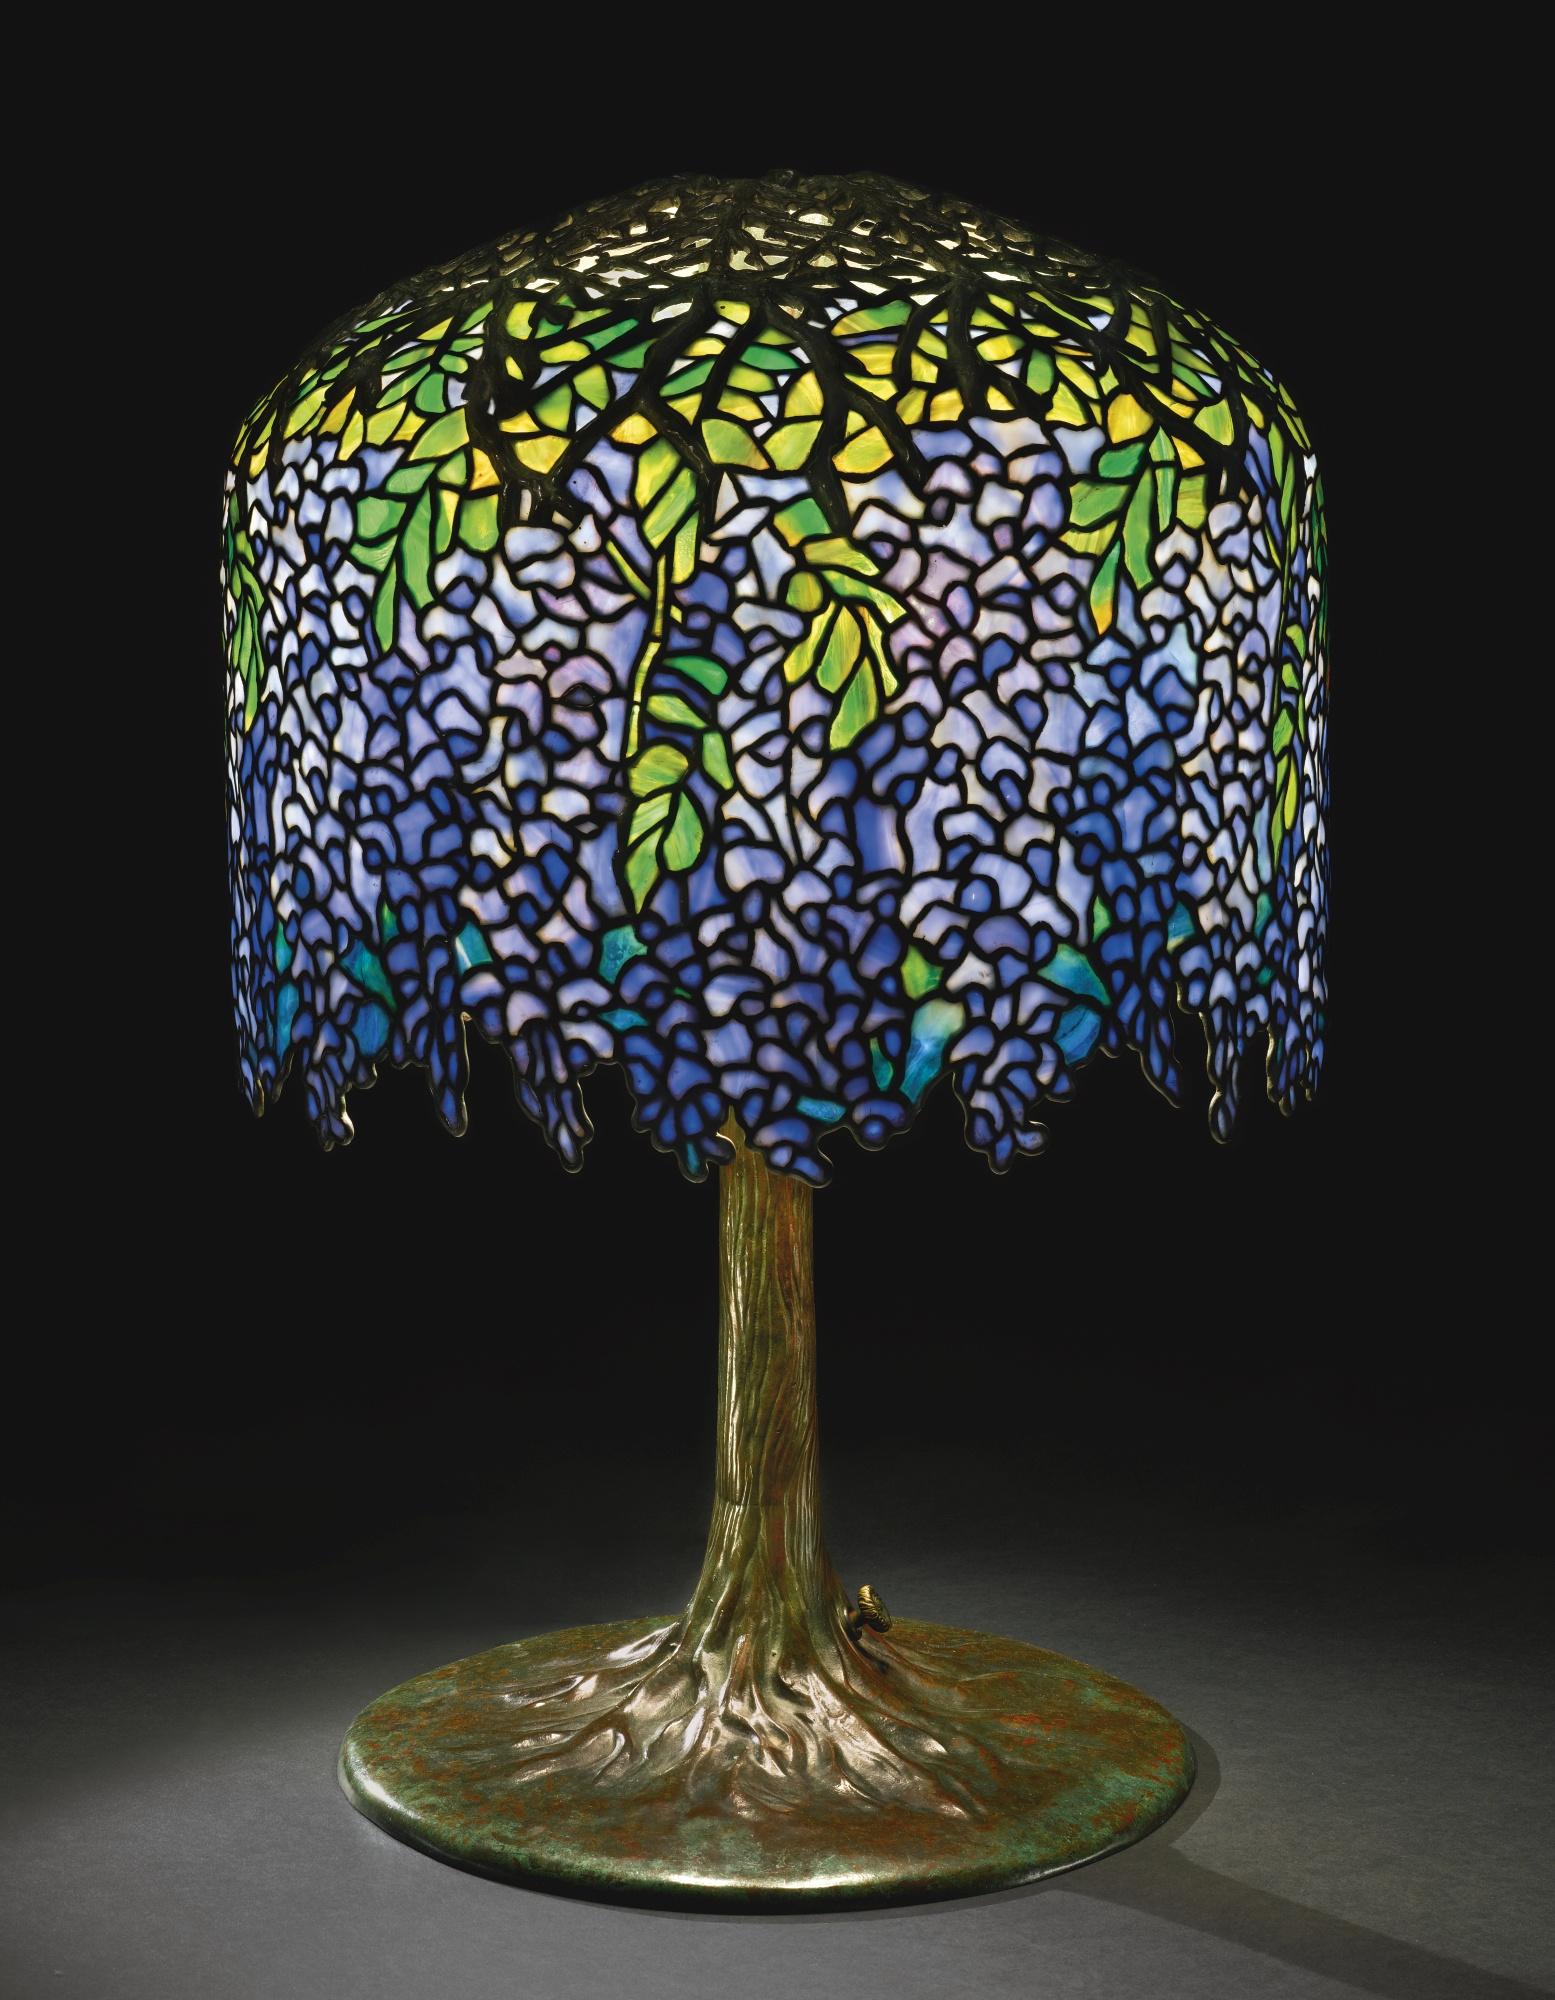 vintage-tiffany-lamps-photo-7